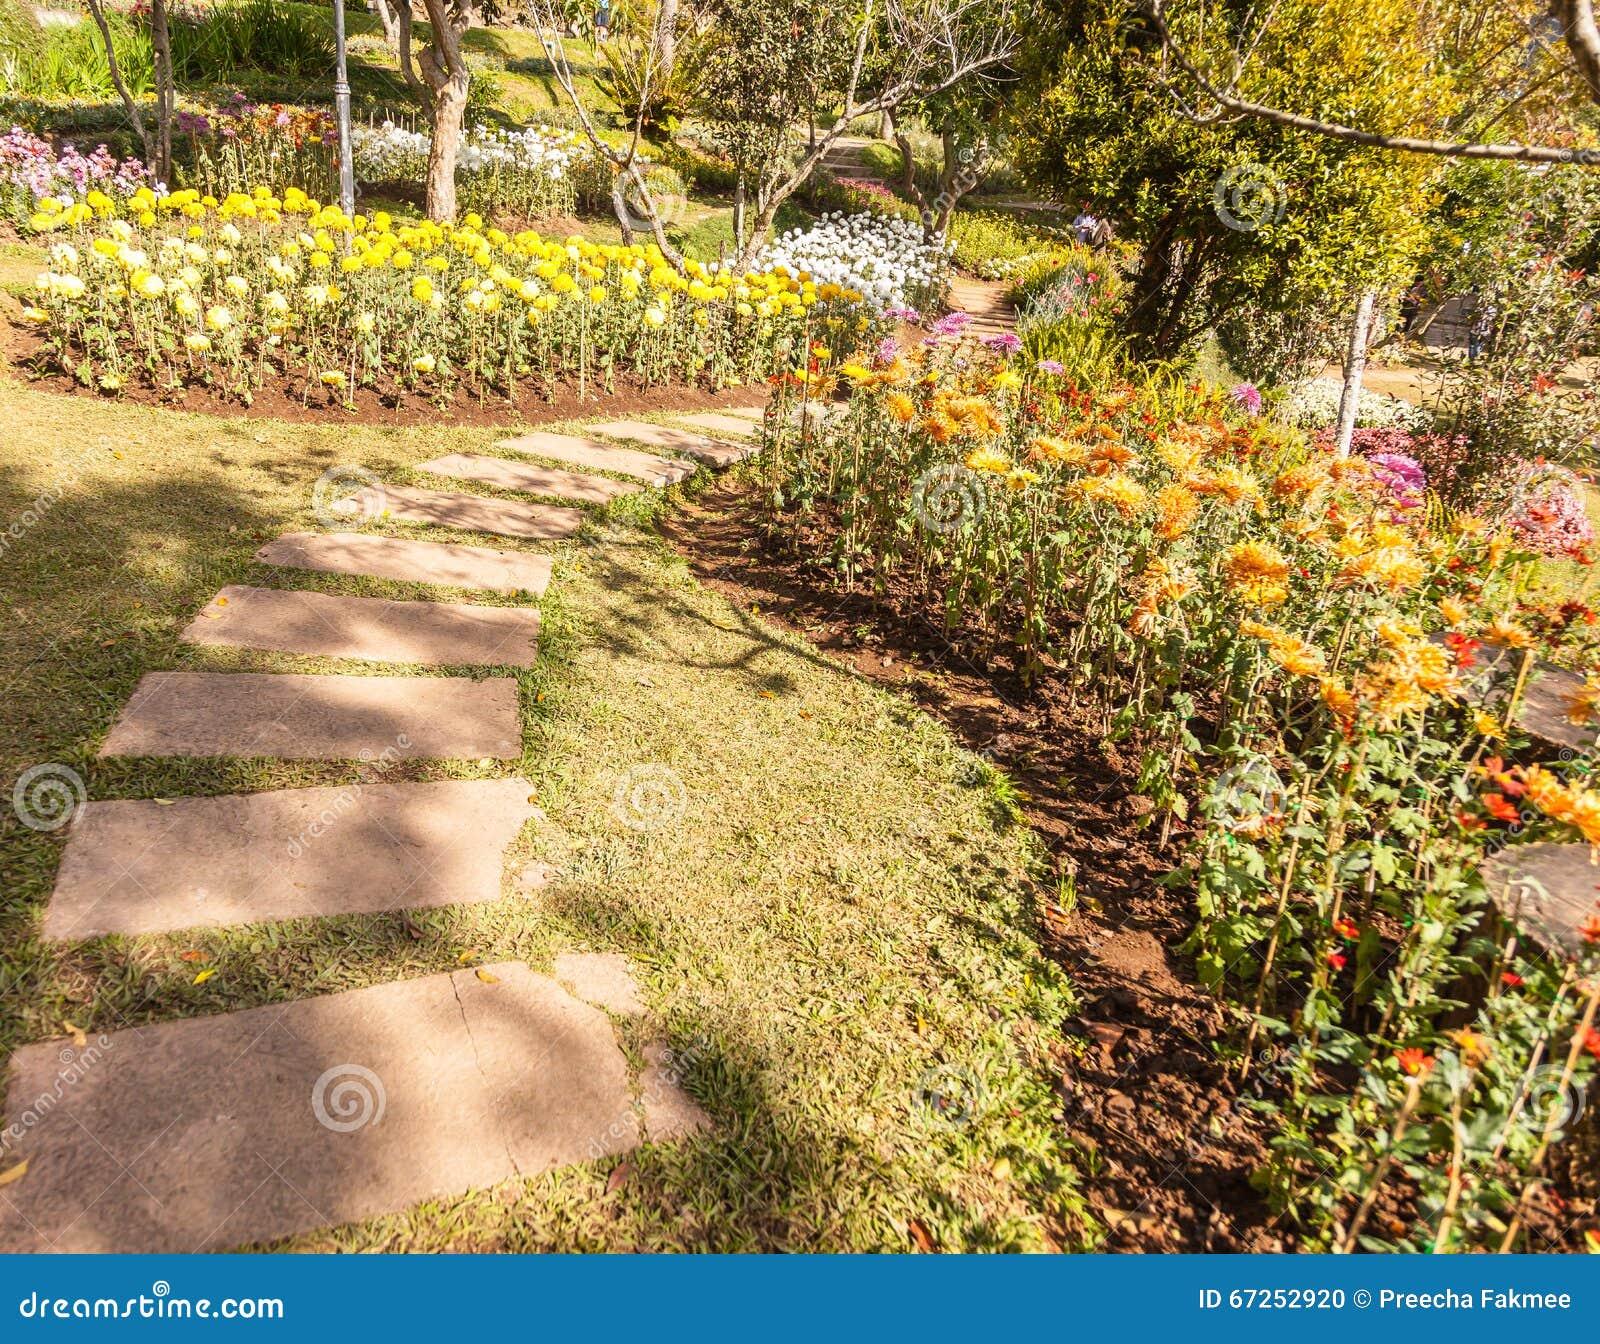 Stone Path Winding In Fresh Spring Flower Garden Stock Photo - Image ...